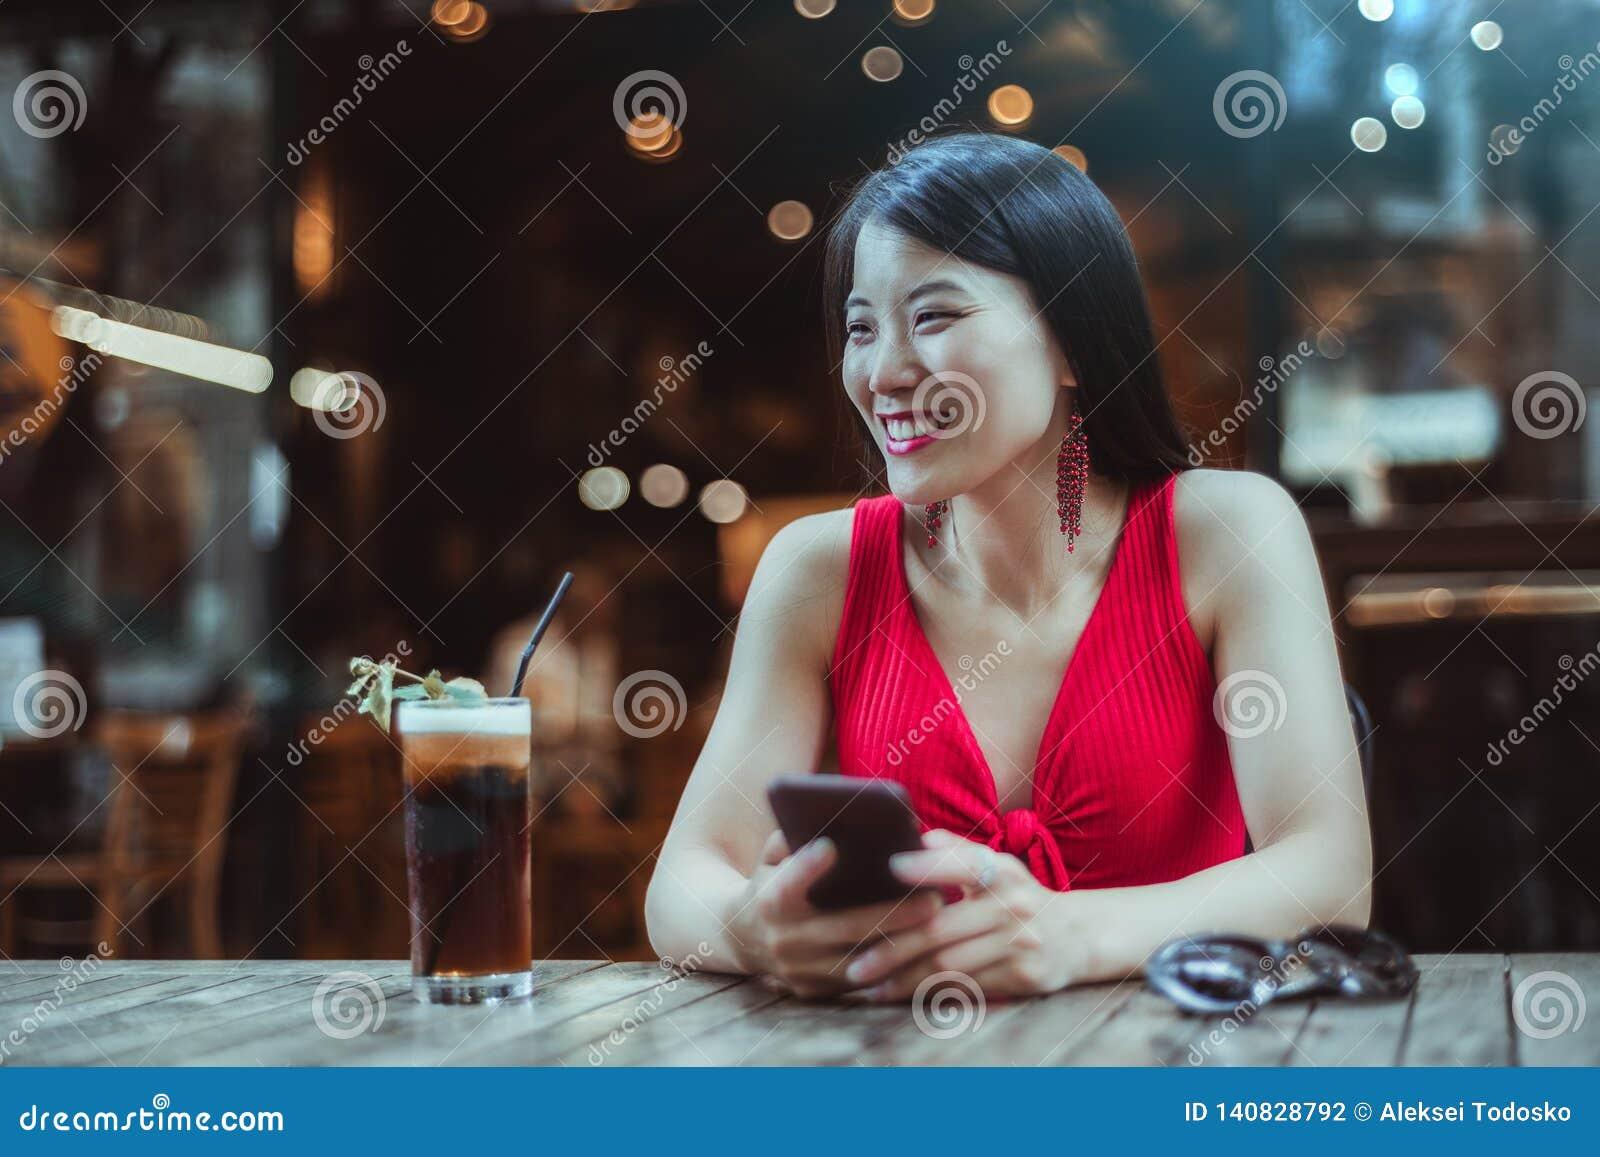 Asian girls nightclub pictures